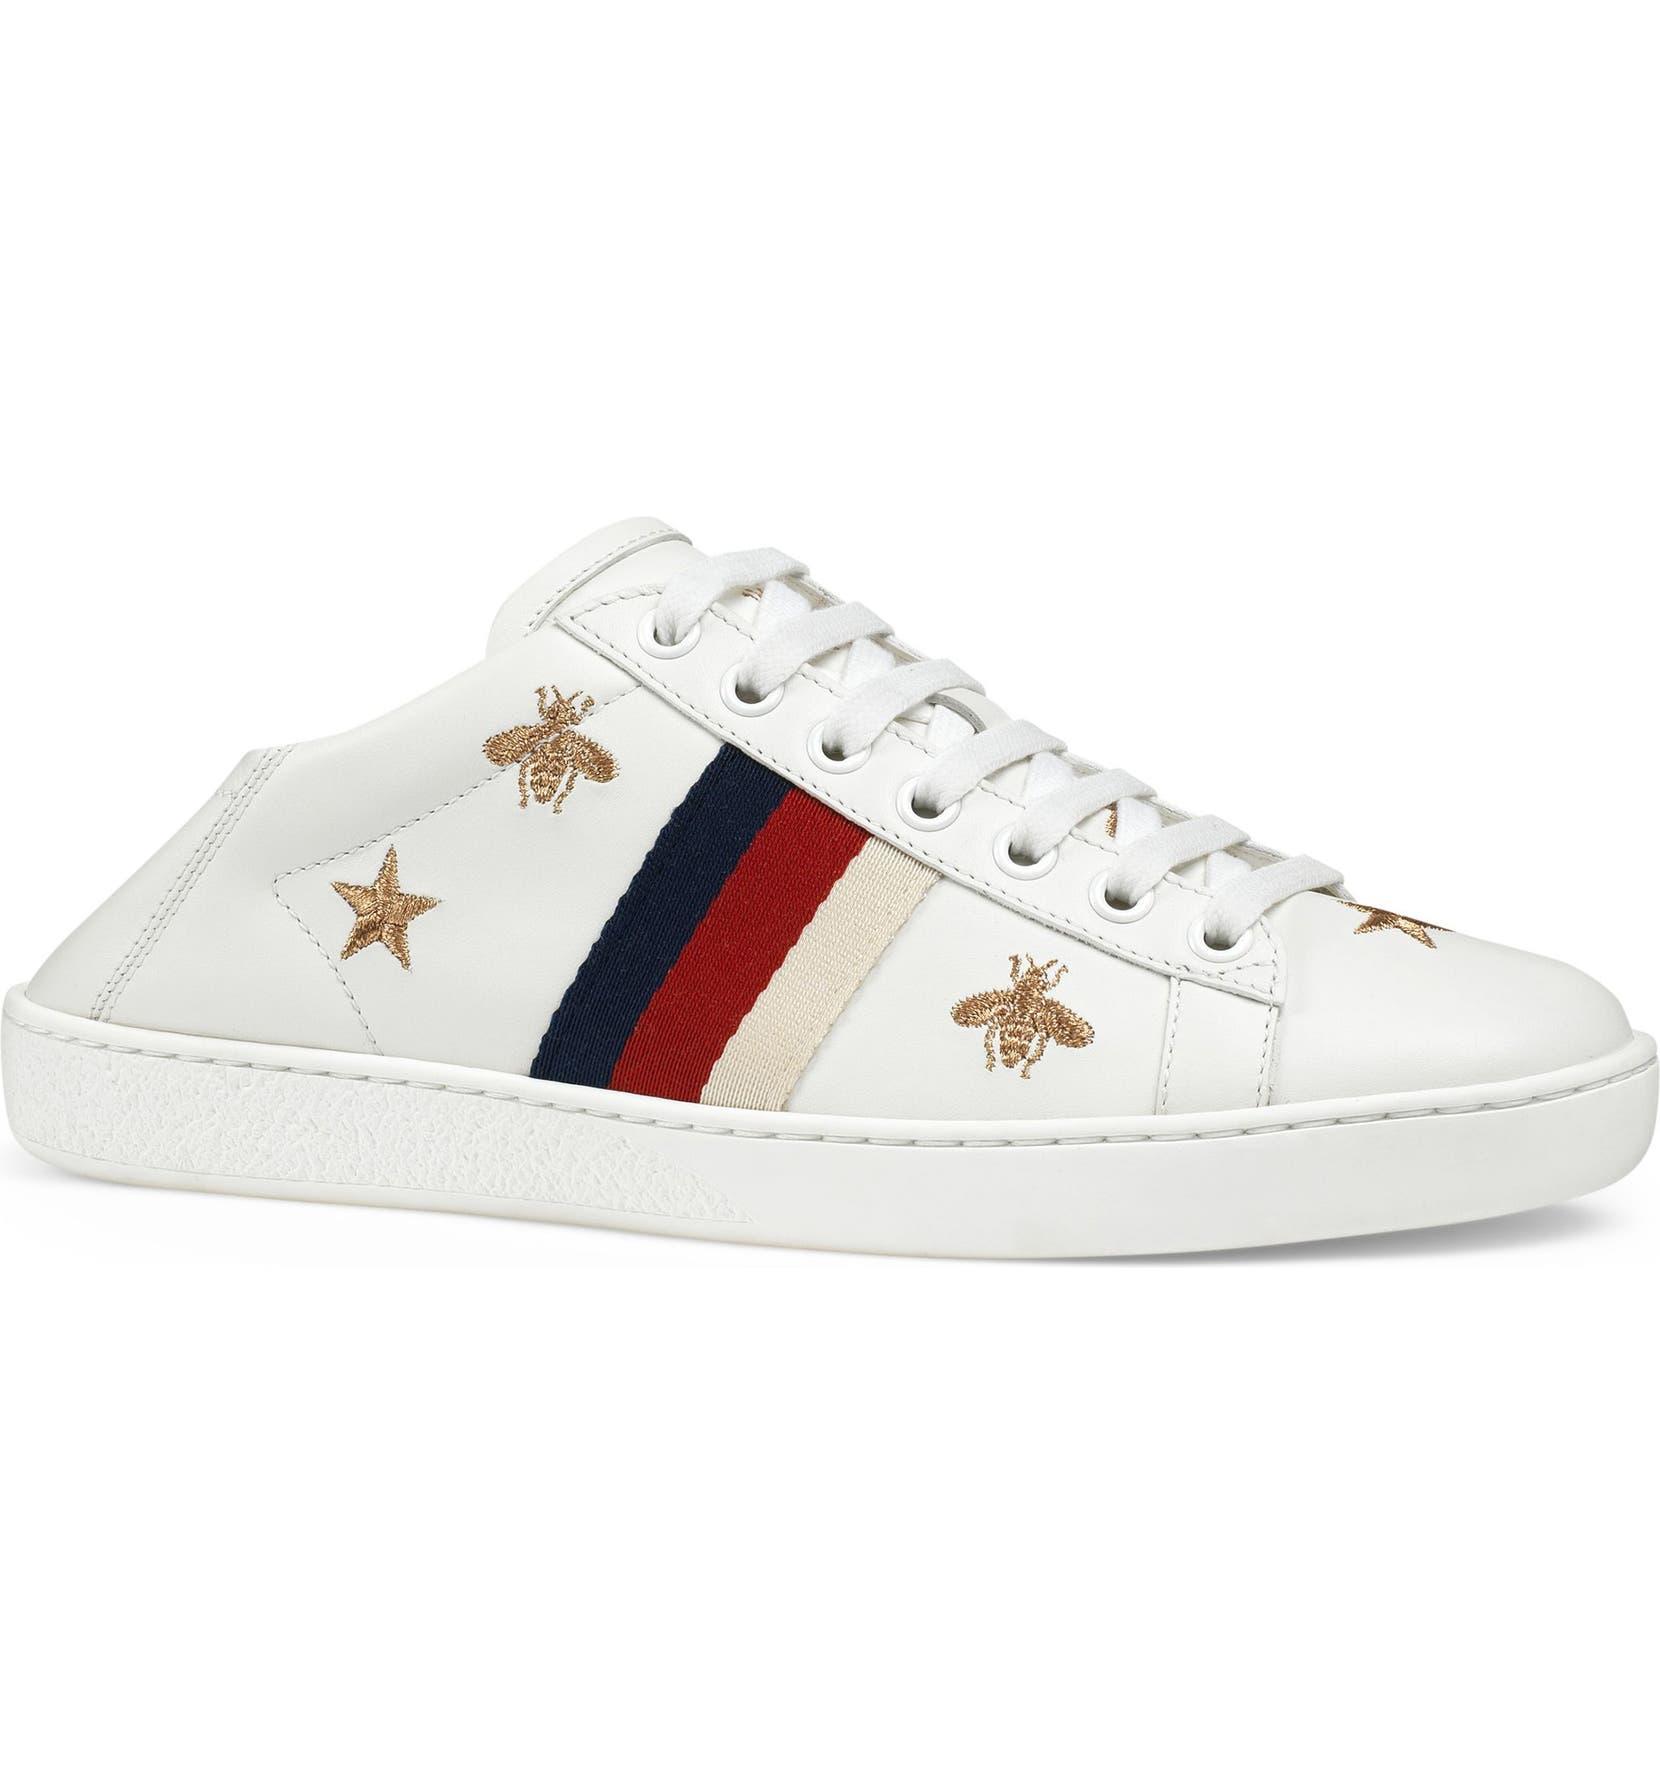 3c9fbf5f9 Gucci New Ace Convertible Heel Sneaker (Women)   Nordstrom